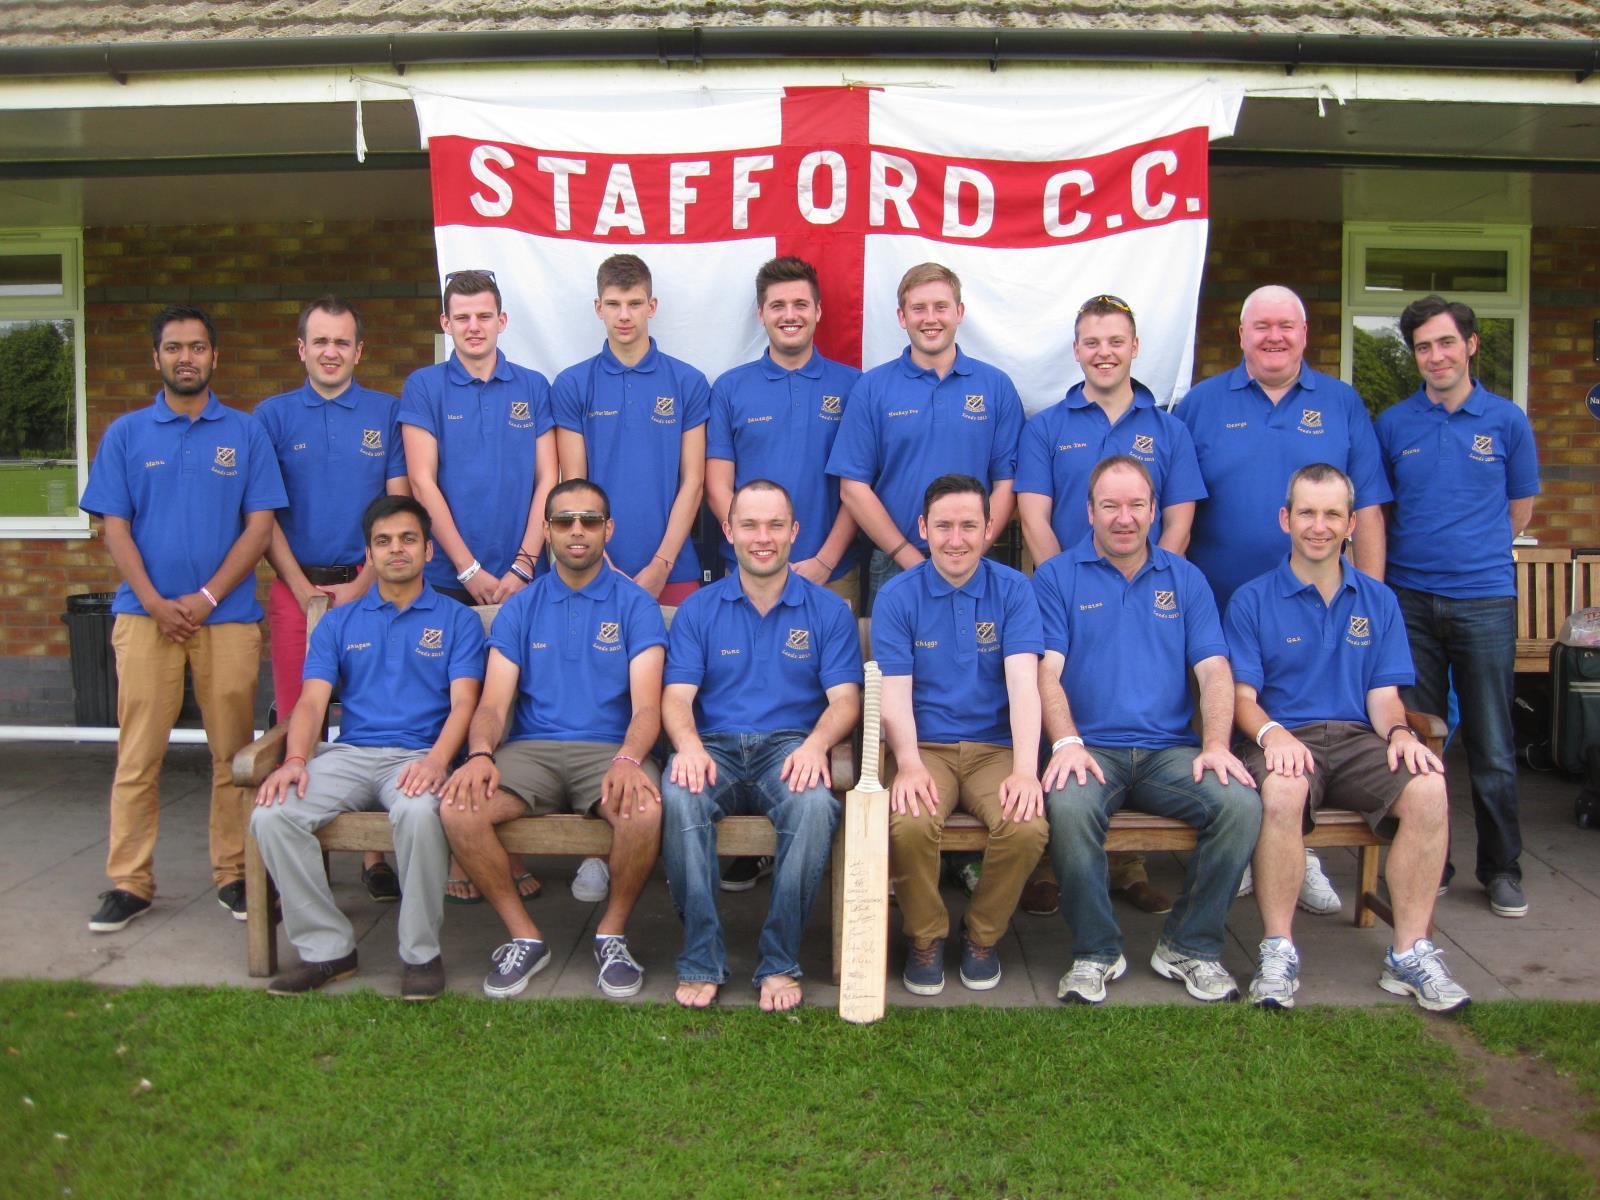 Stafford CC Tour 2013